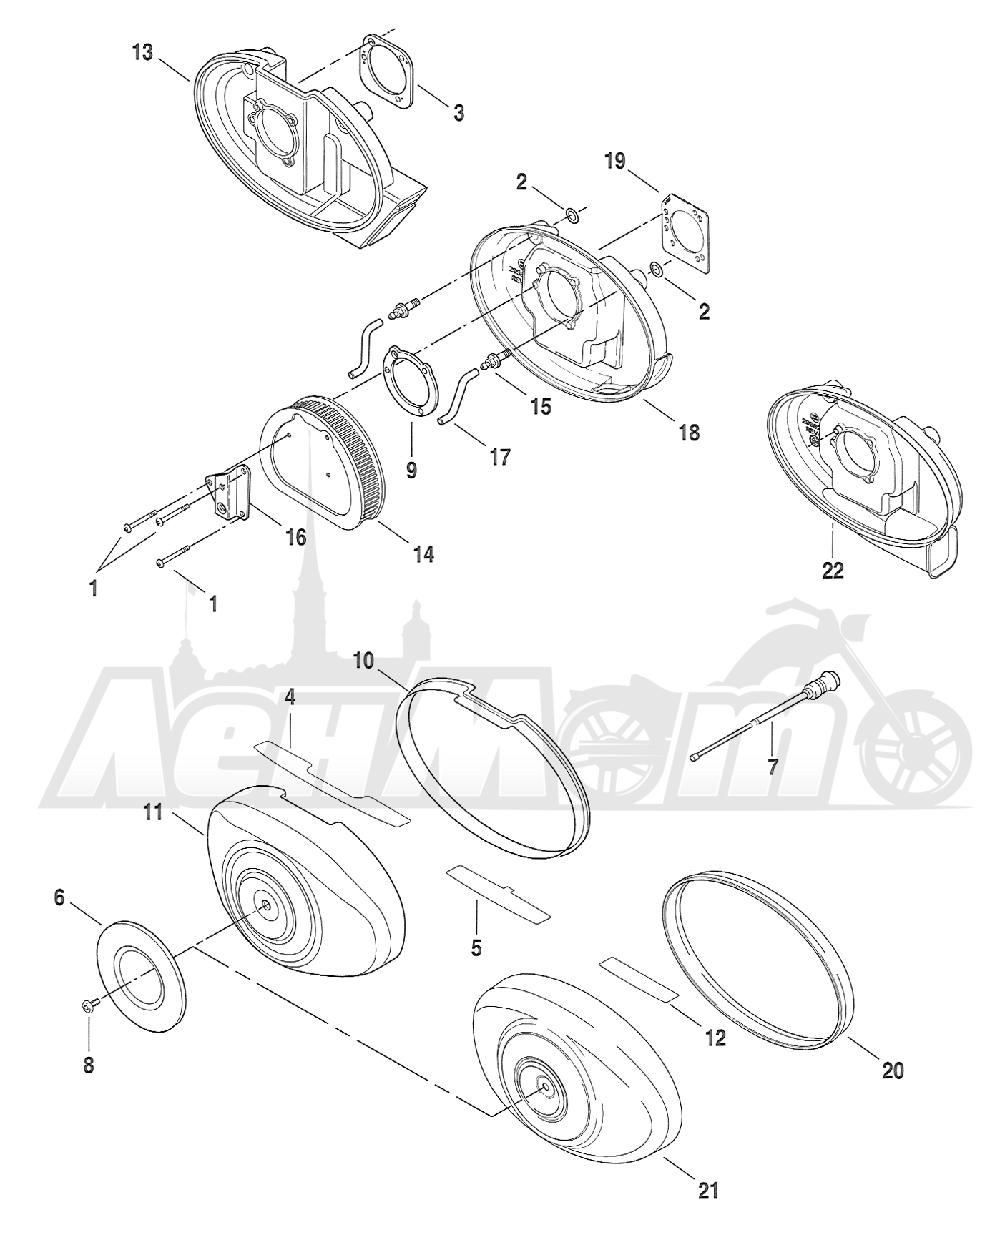 Запчасти для Мотоцикла Harley-Davidson 2005 FXSTD SOFTAIL® (BS) (CARBURATED) Раздел: AIR CLEANER ASSEMBLY W/ ENRICHENER | очиститель воздуха в сборе вместе с ENRICHENER